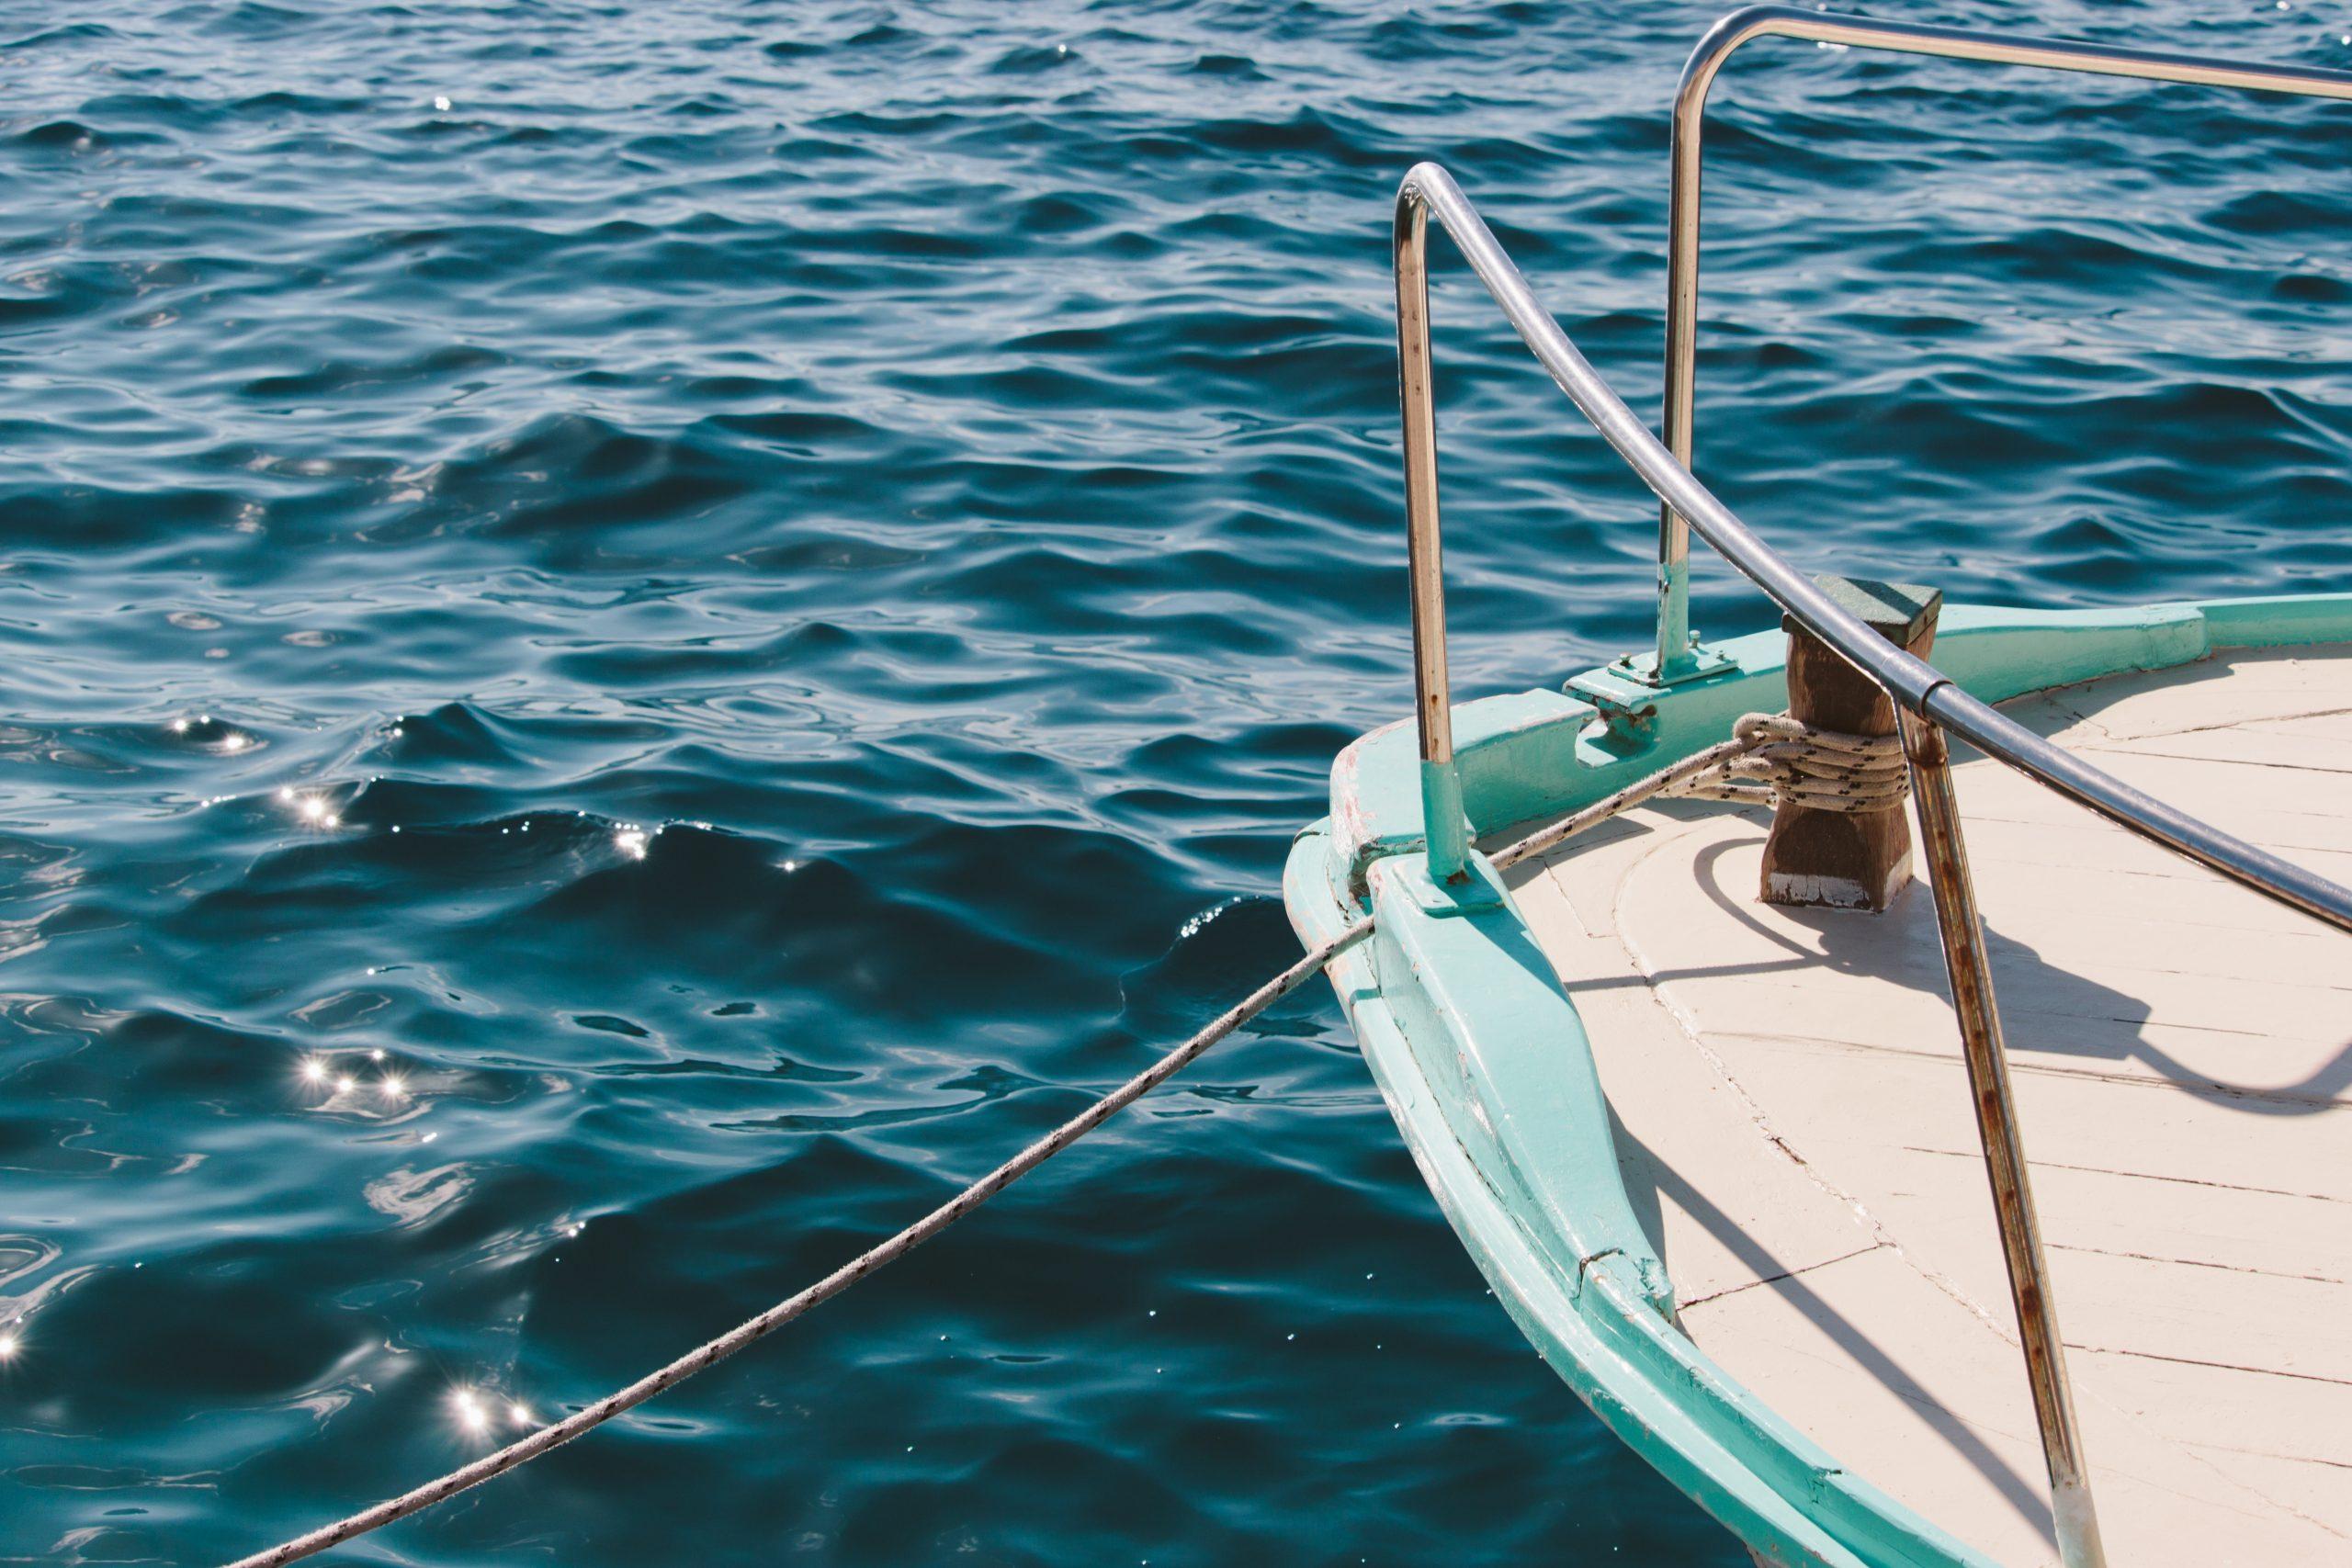 playa barco denia experience mar